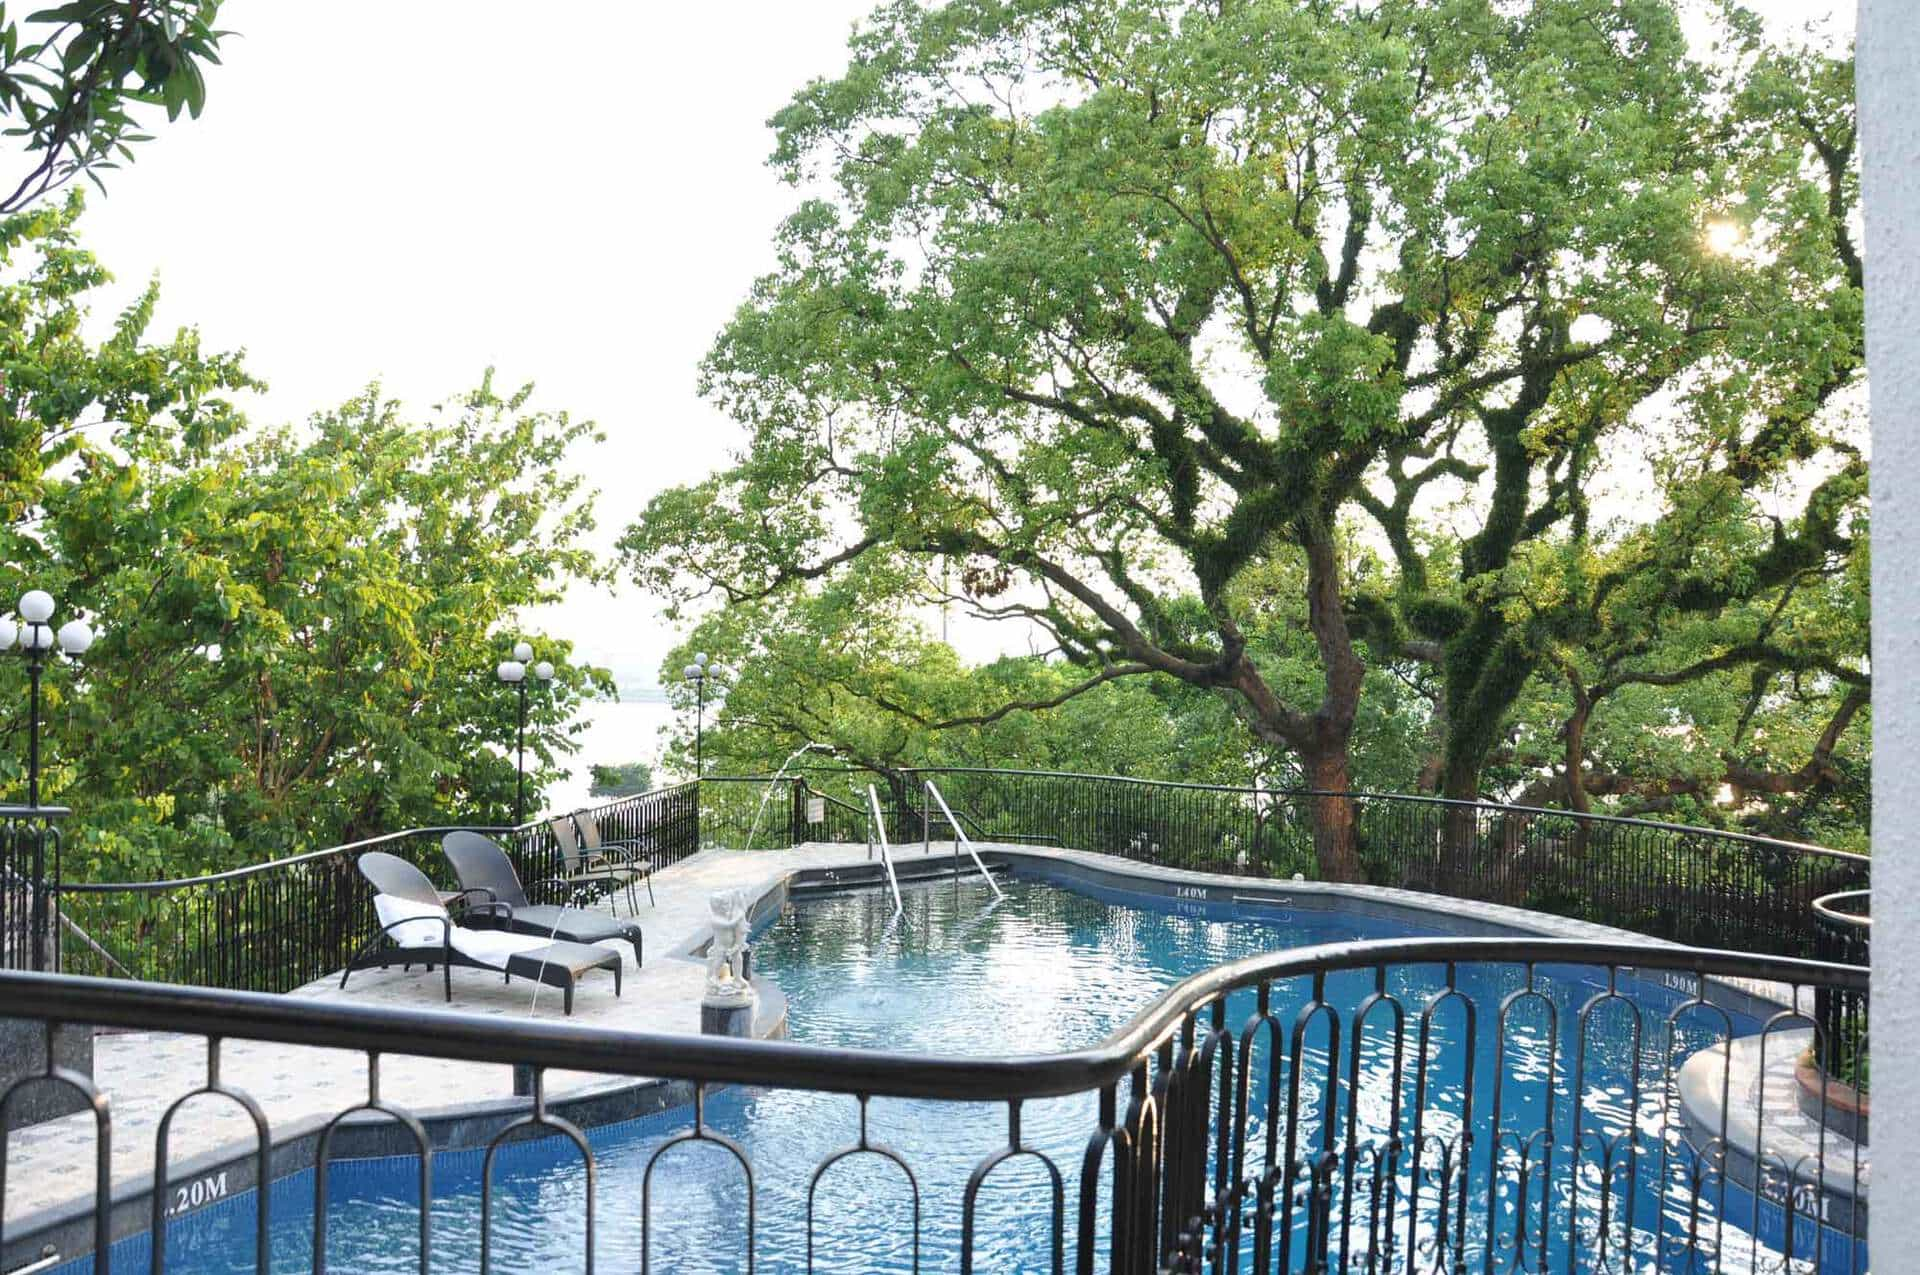 Pousada de Sao Tiago Macau Barra Suite pool